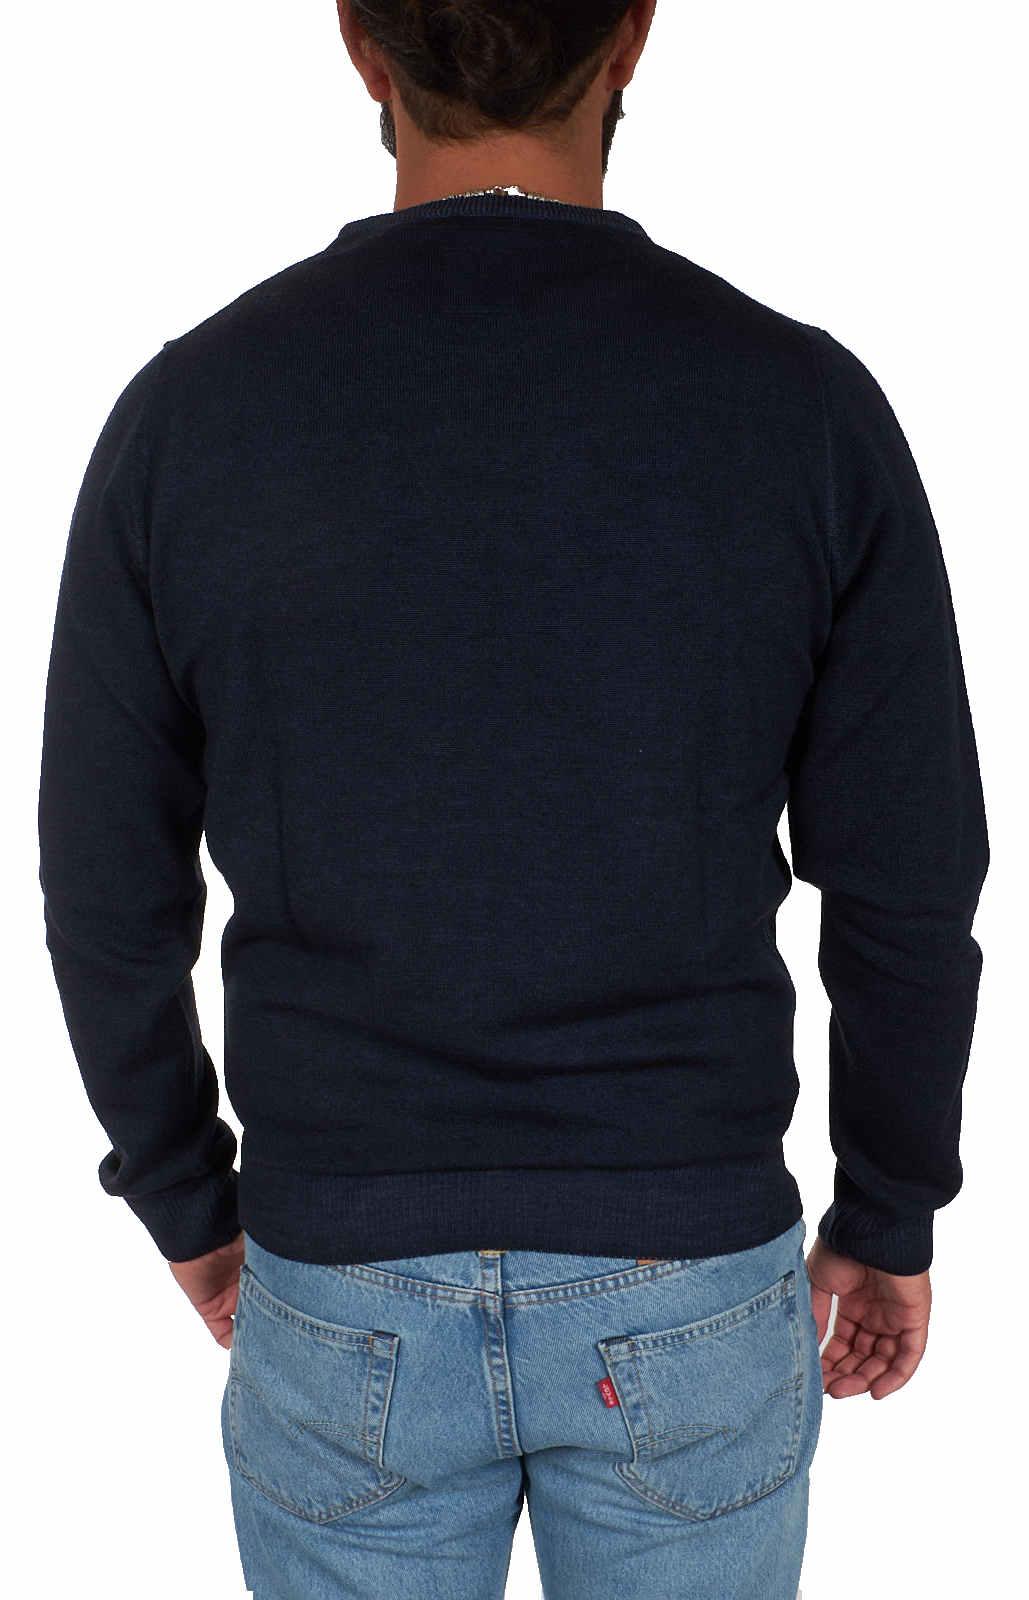 Animal Grau Marl Content Kapuzenpullover Feine Verarbeitung Kleidung & Accessoires Sport-kapuzenpullis & -sweatshirts